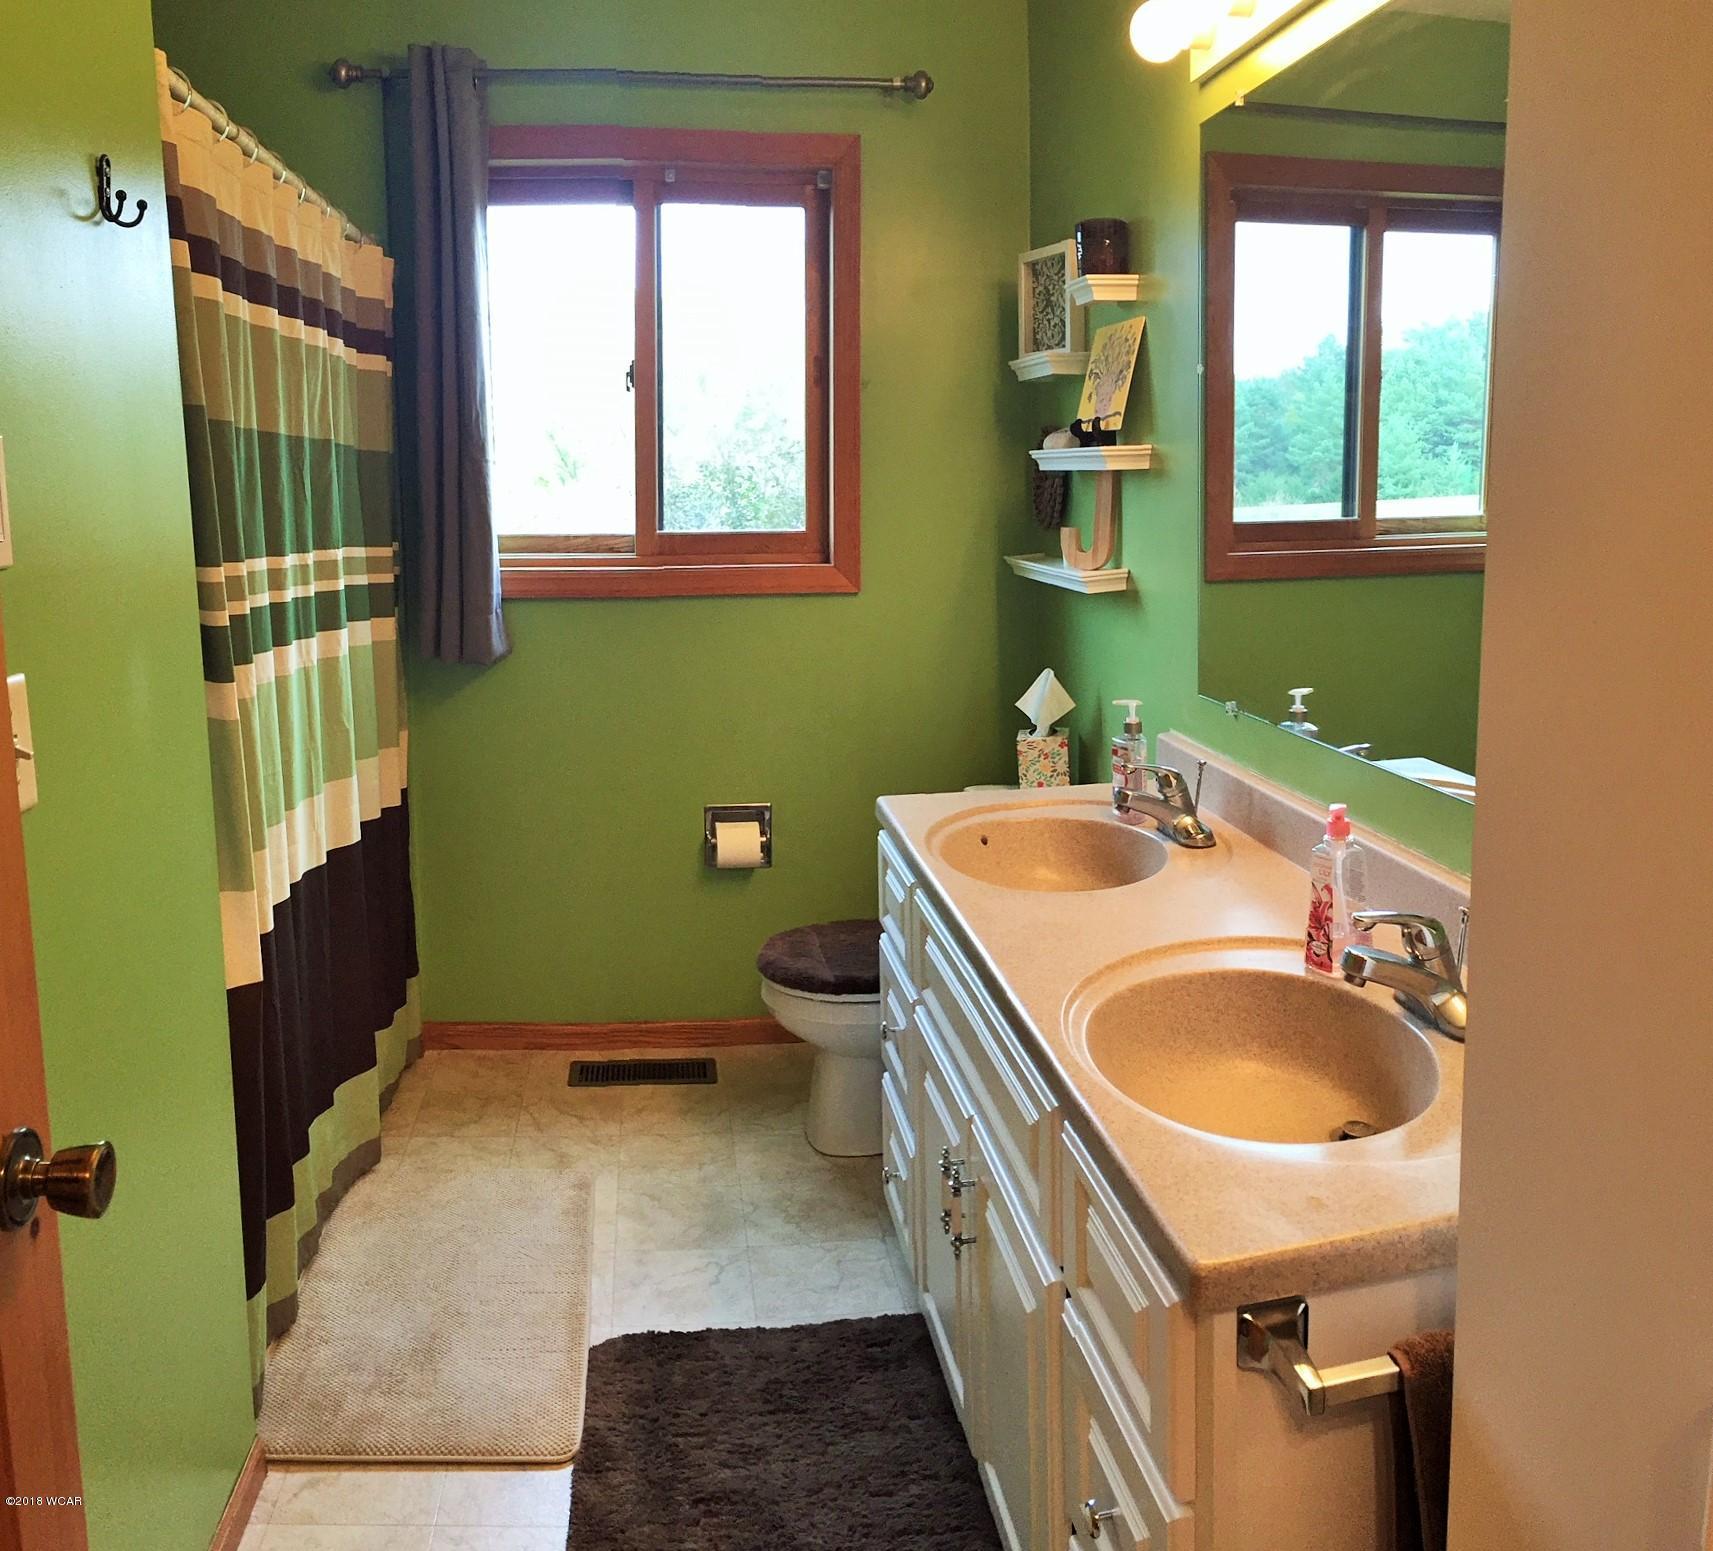 12790 52 Street,Spicer,3 Bedrooms Bedrooms,2 BathroomsBathrooms,Single Family,52 Street,6032412